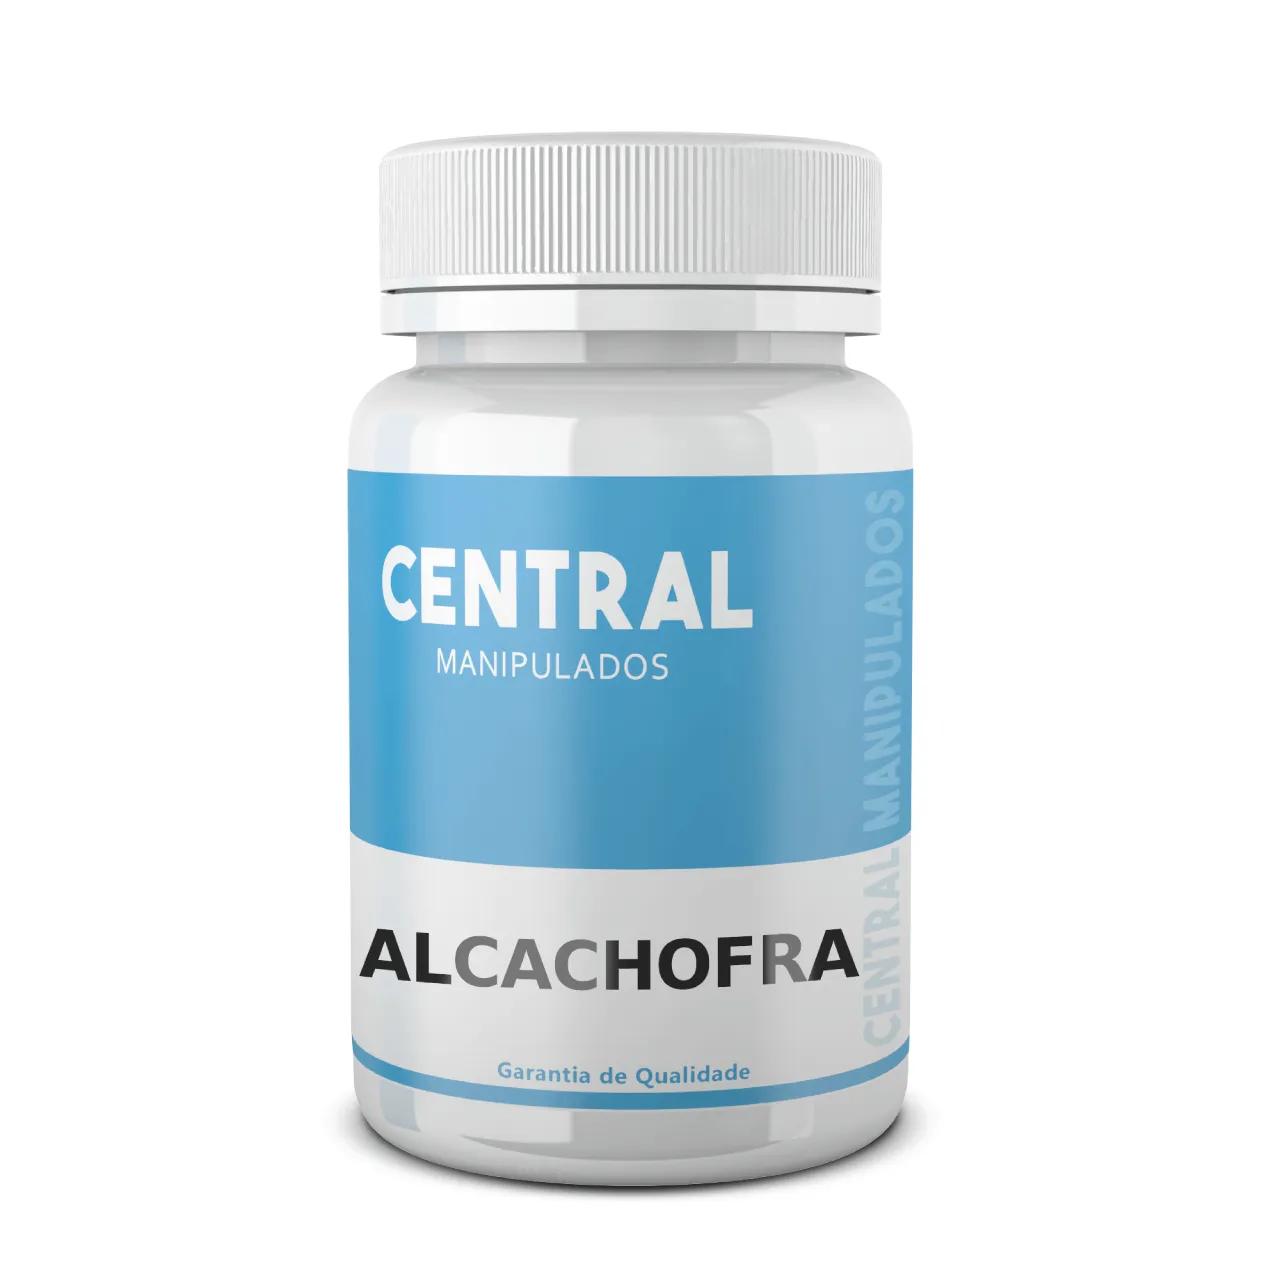 Alcachofra 500mg - 60 cápsulas - Diurético, Antioxidante, Hepatoprotetora